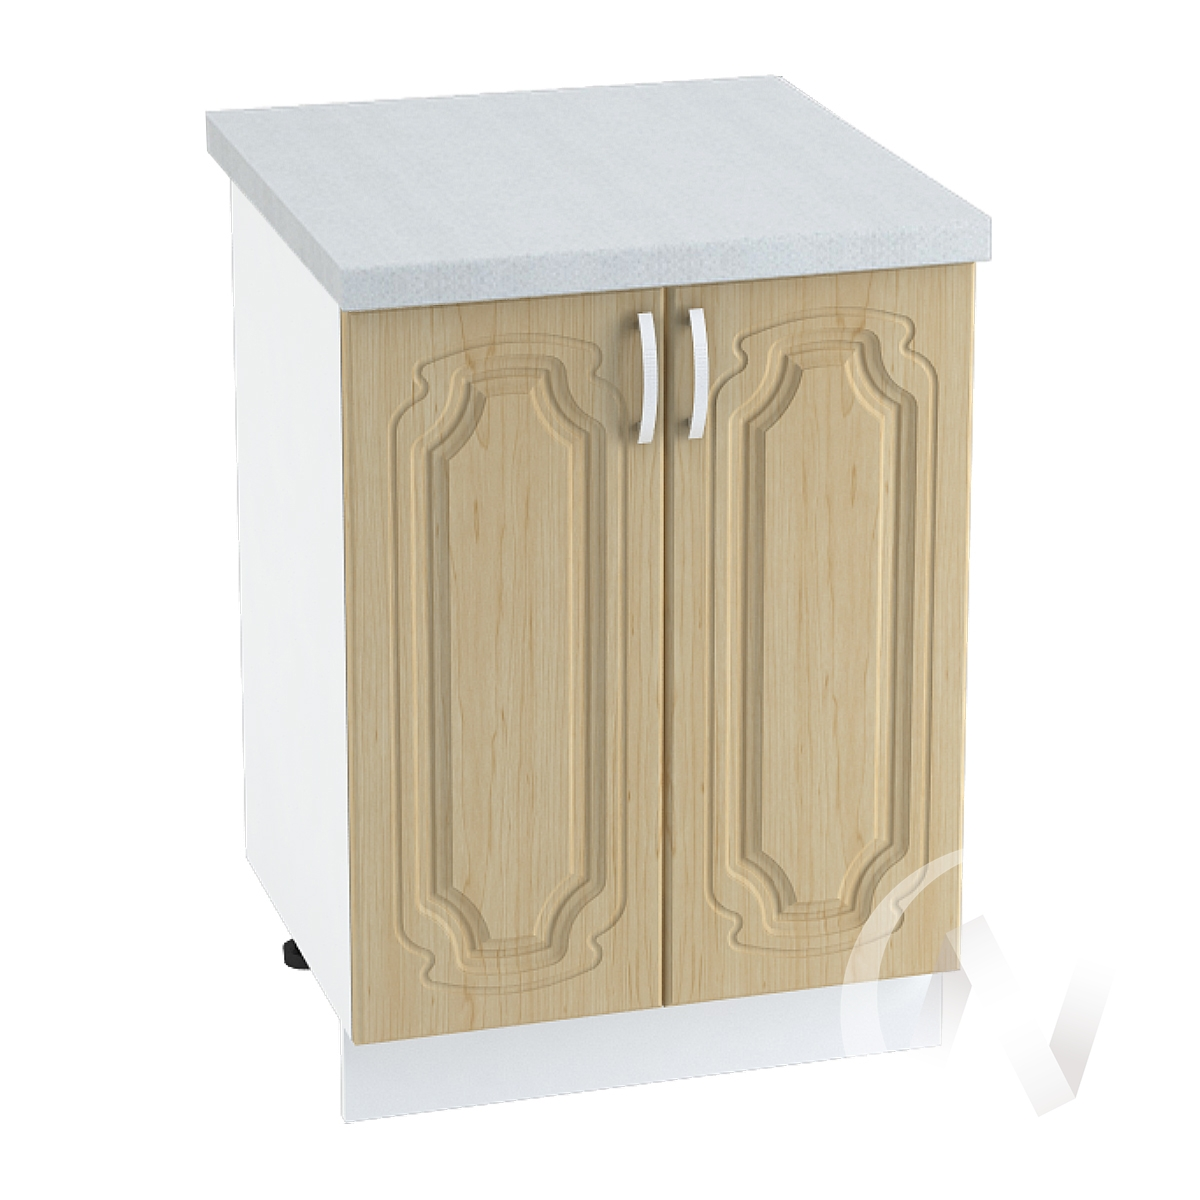 "Кухня ""Настя"": Шкаф нижний 600, ШН 600 новый (Береза/корпус белый)"